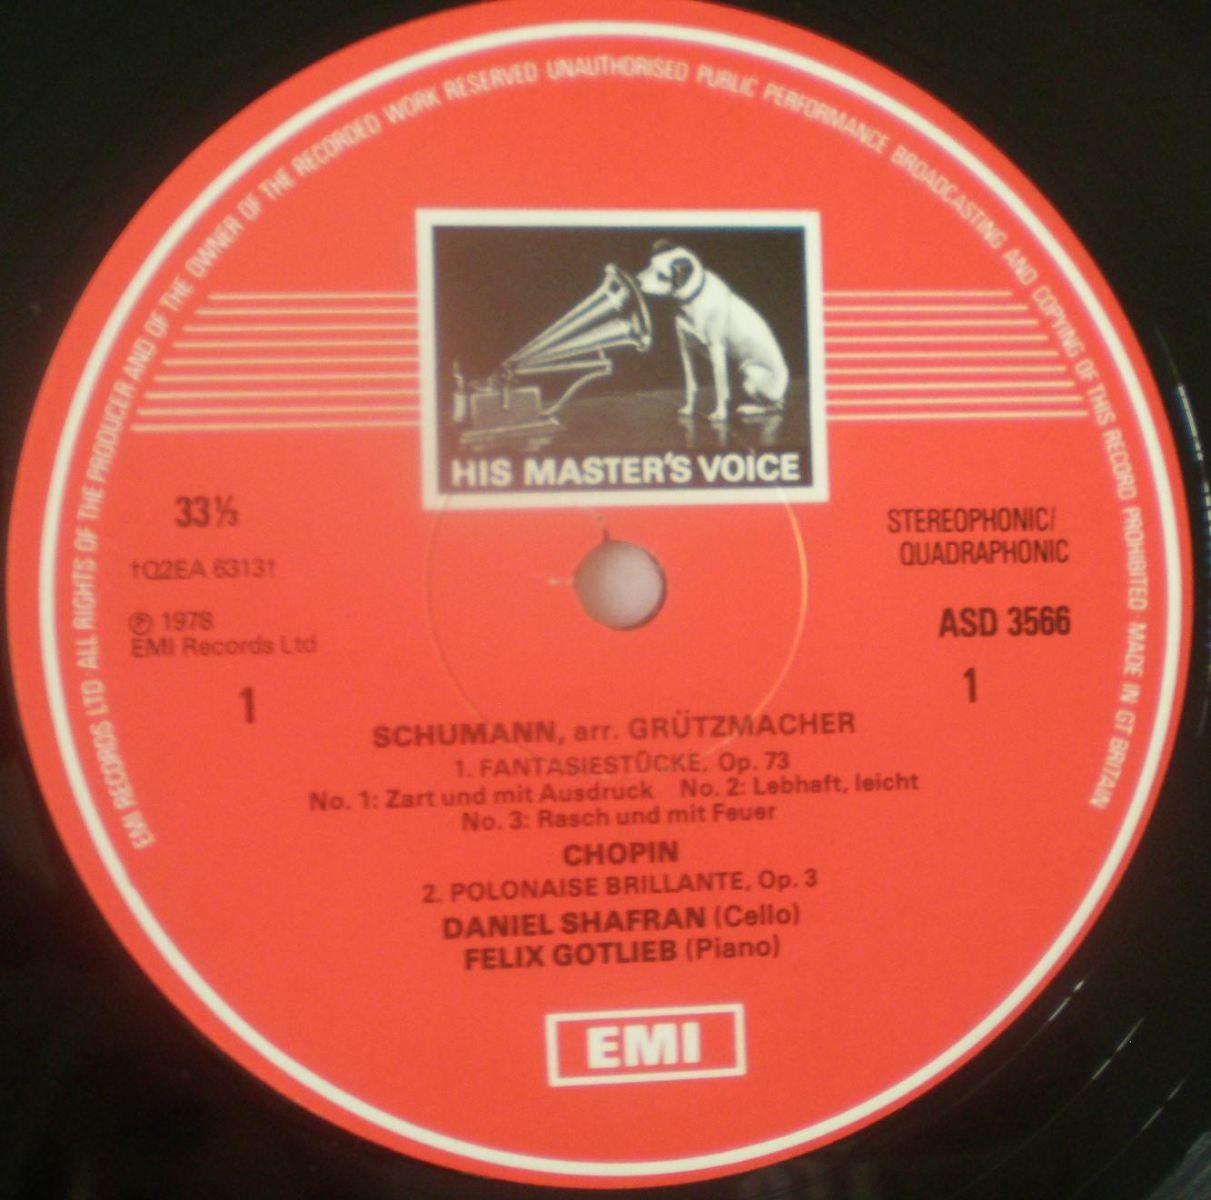 Hmv hmv records hmv label the hmv record label for Classic house record labels